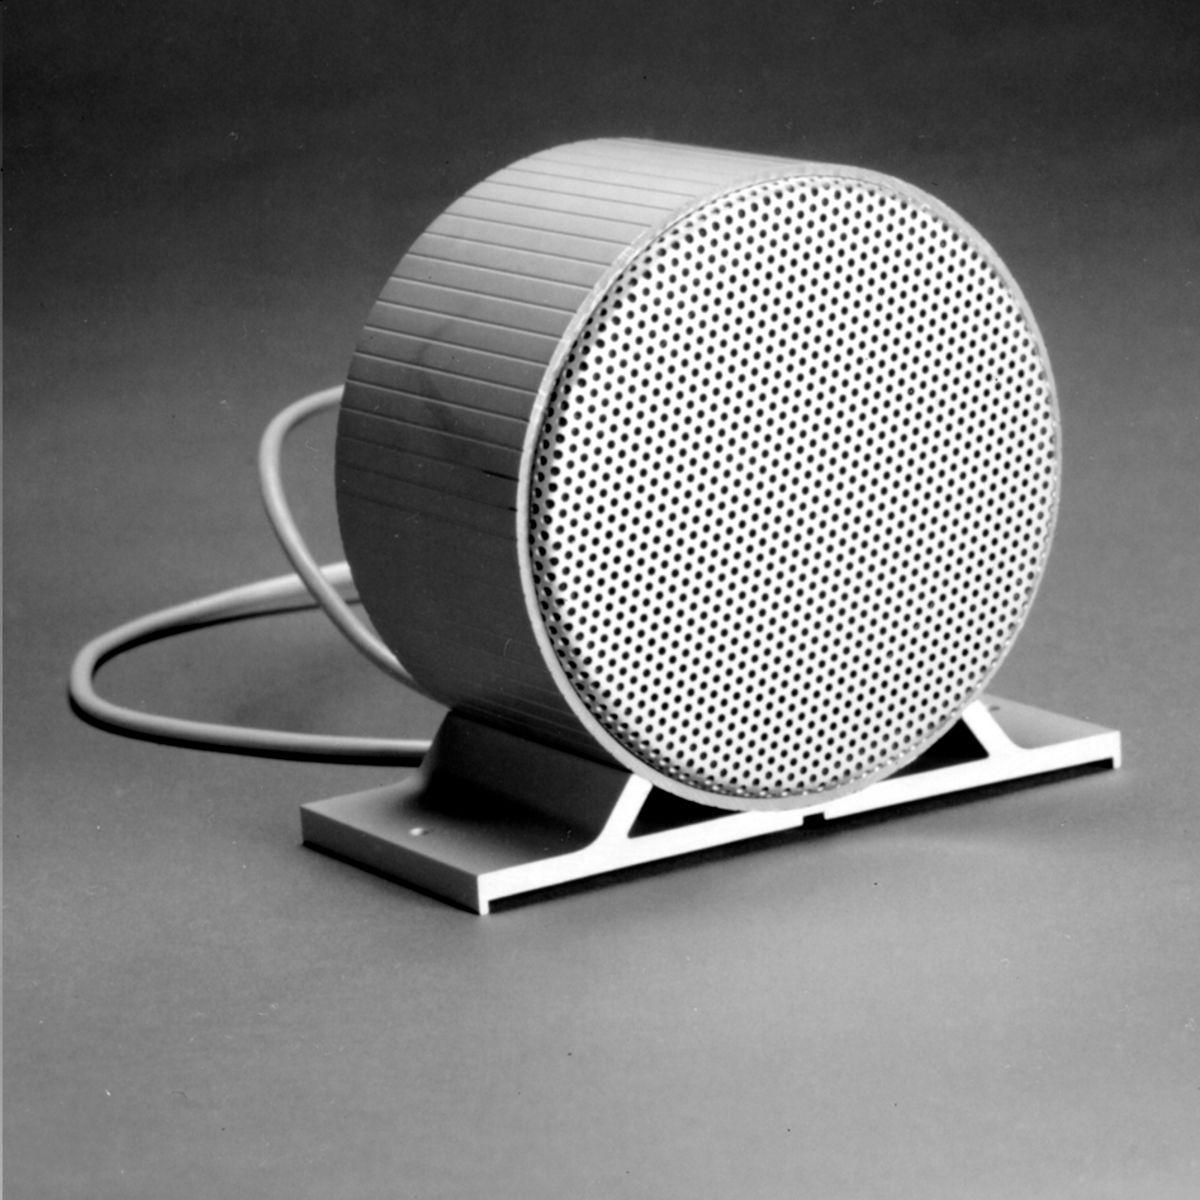 Bi-directional Speaker - Model CAR4-8 | CAR4-8 | GAI-Tronics on